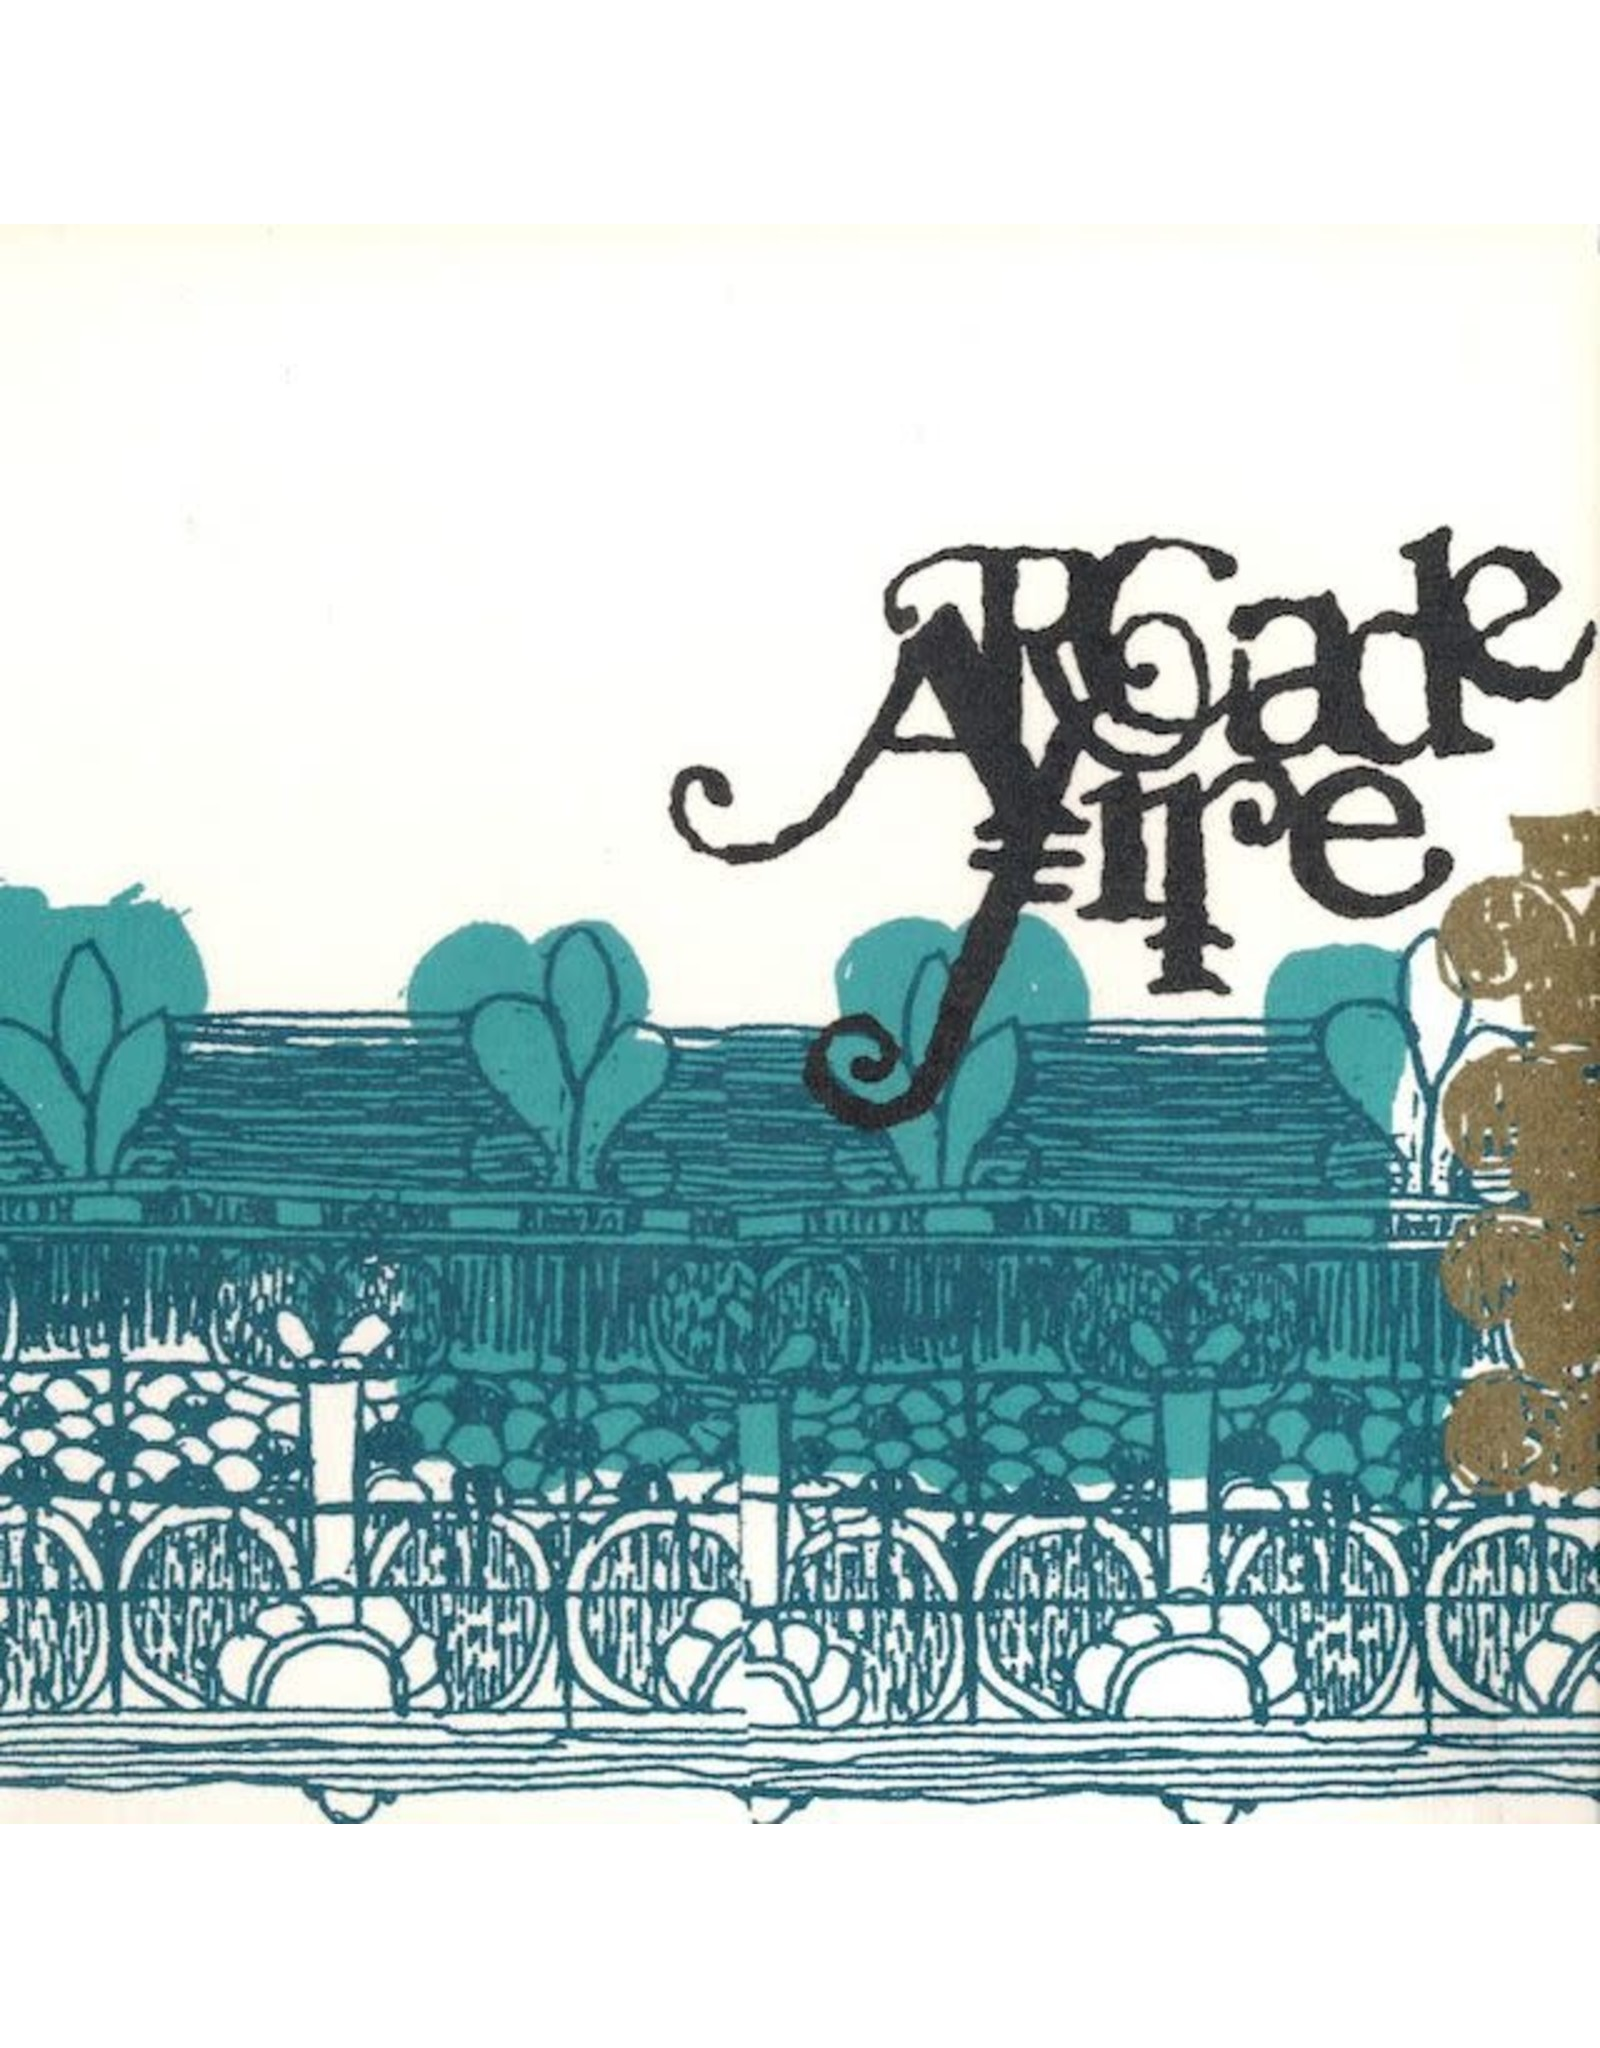 Vinyl Arcade Fire - S/T